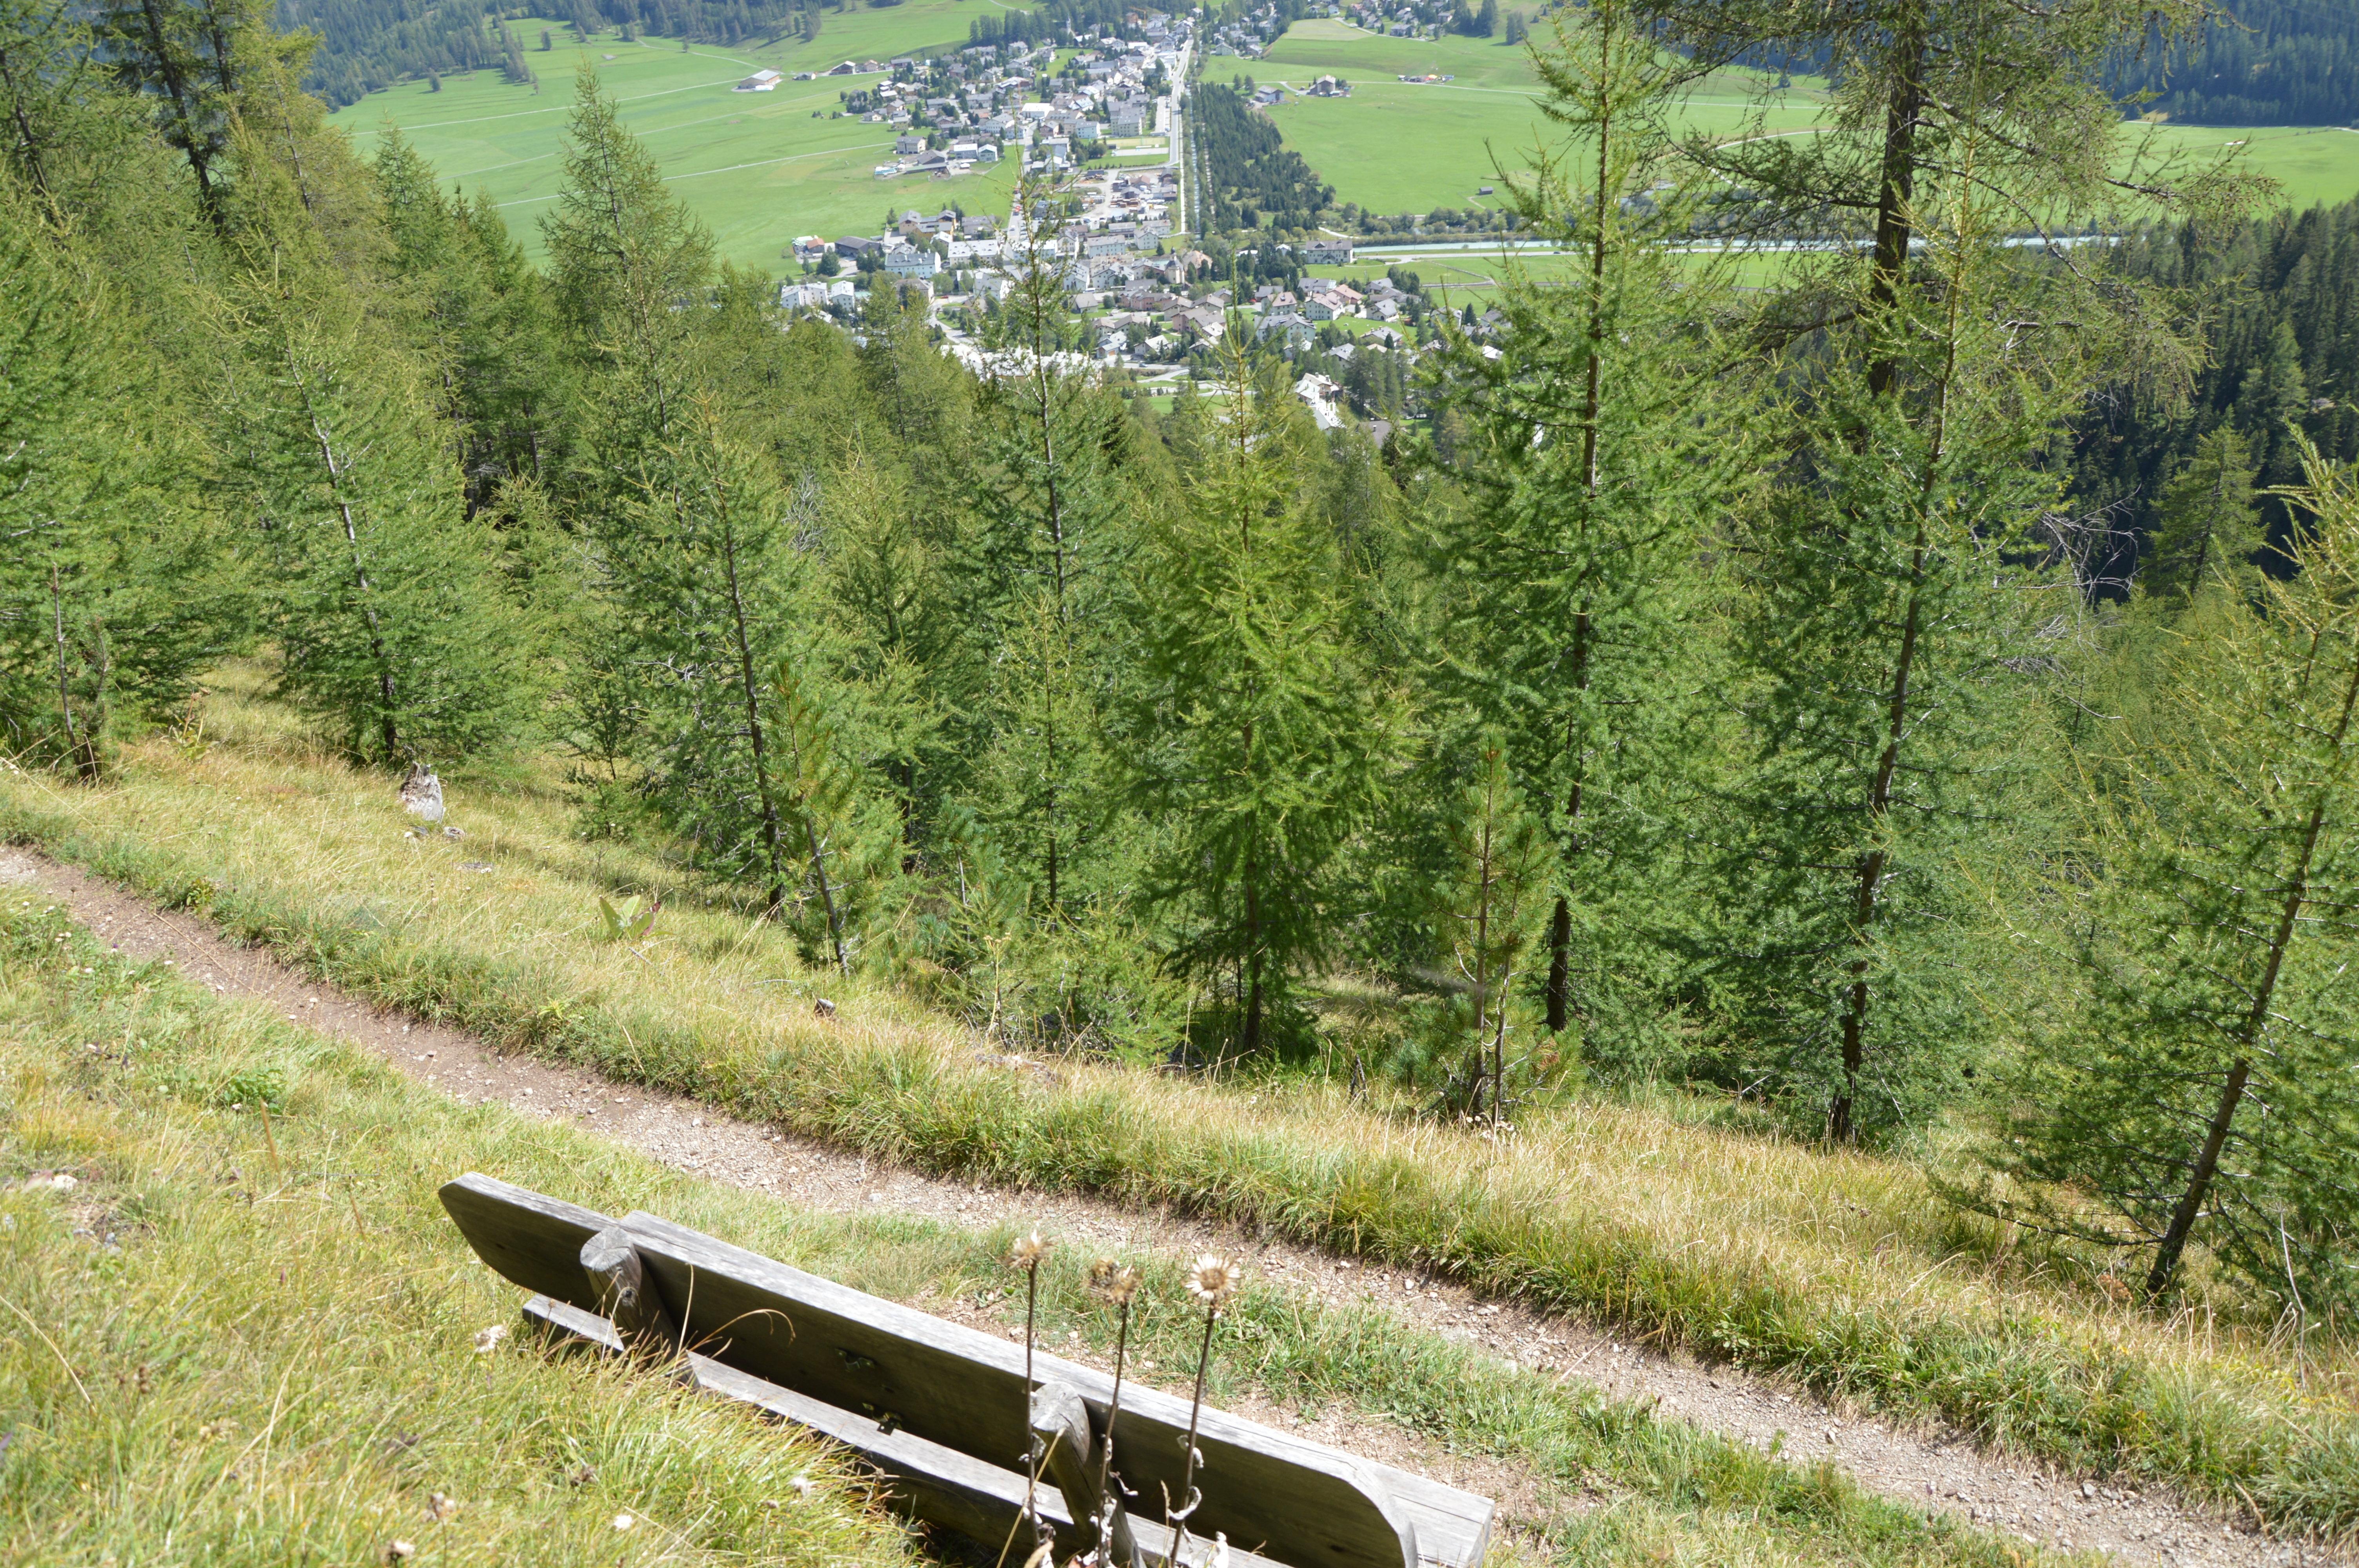 Sitzbank Via Segantini 2 Slide 4